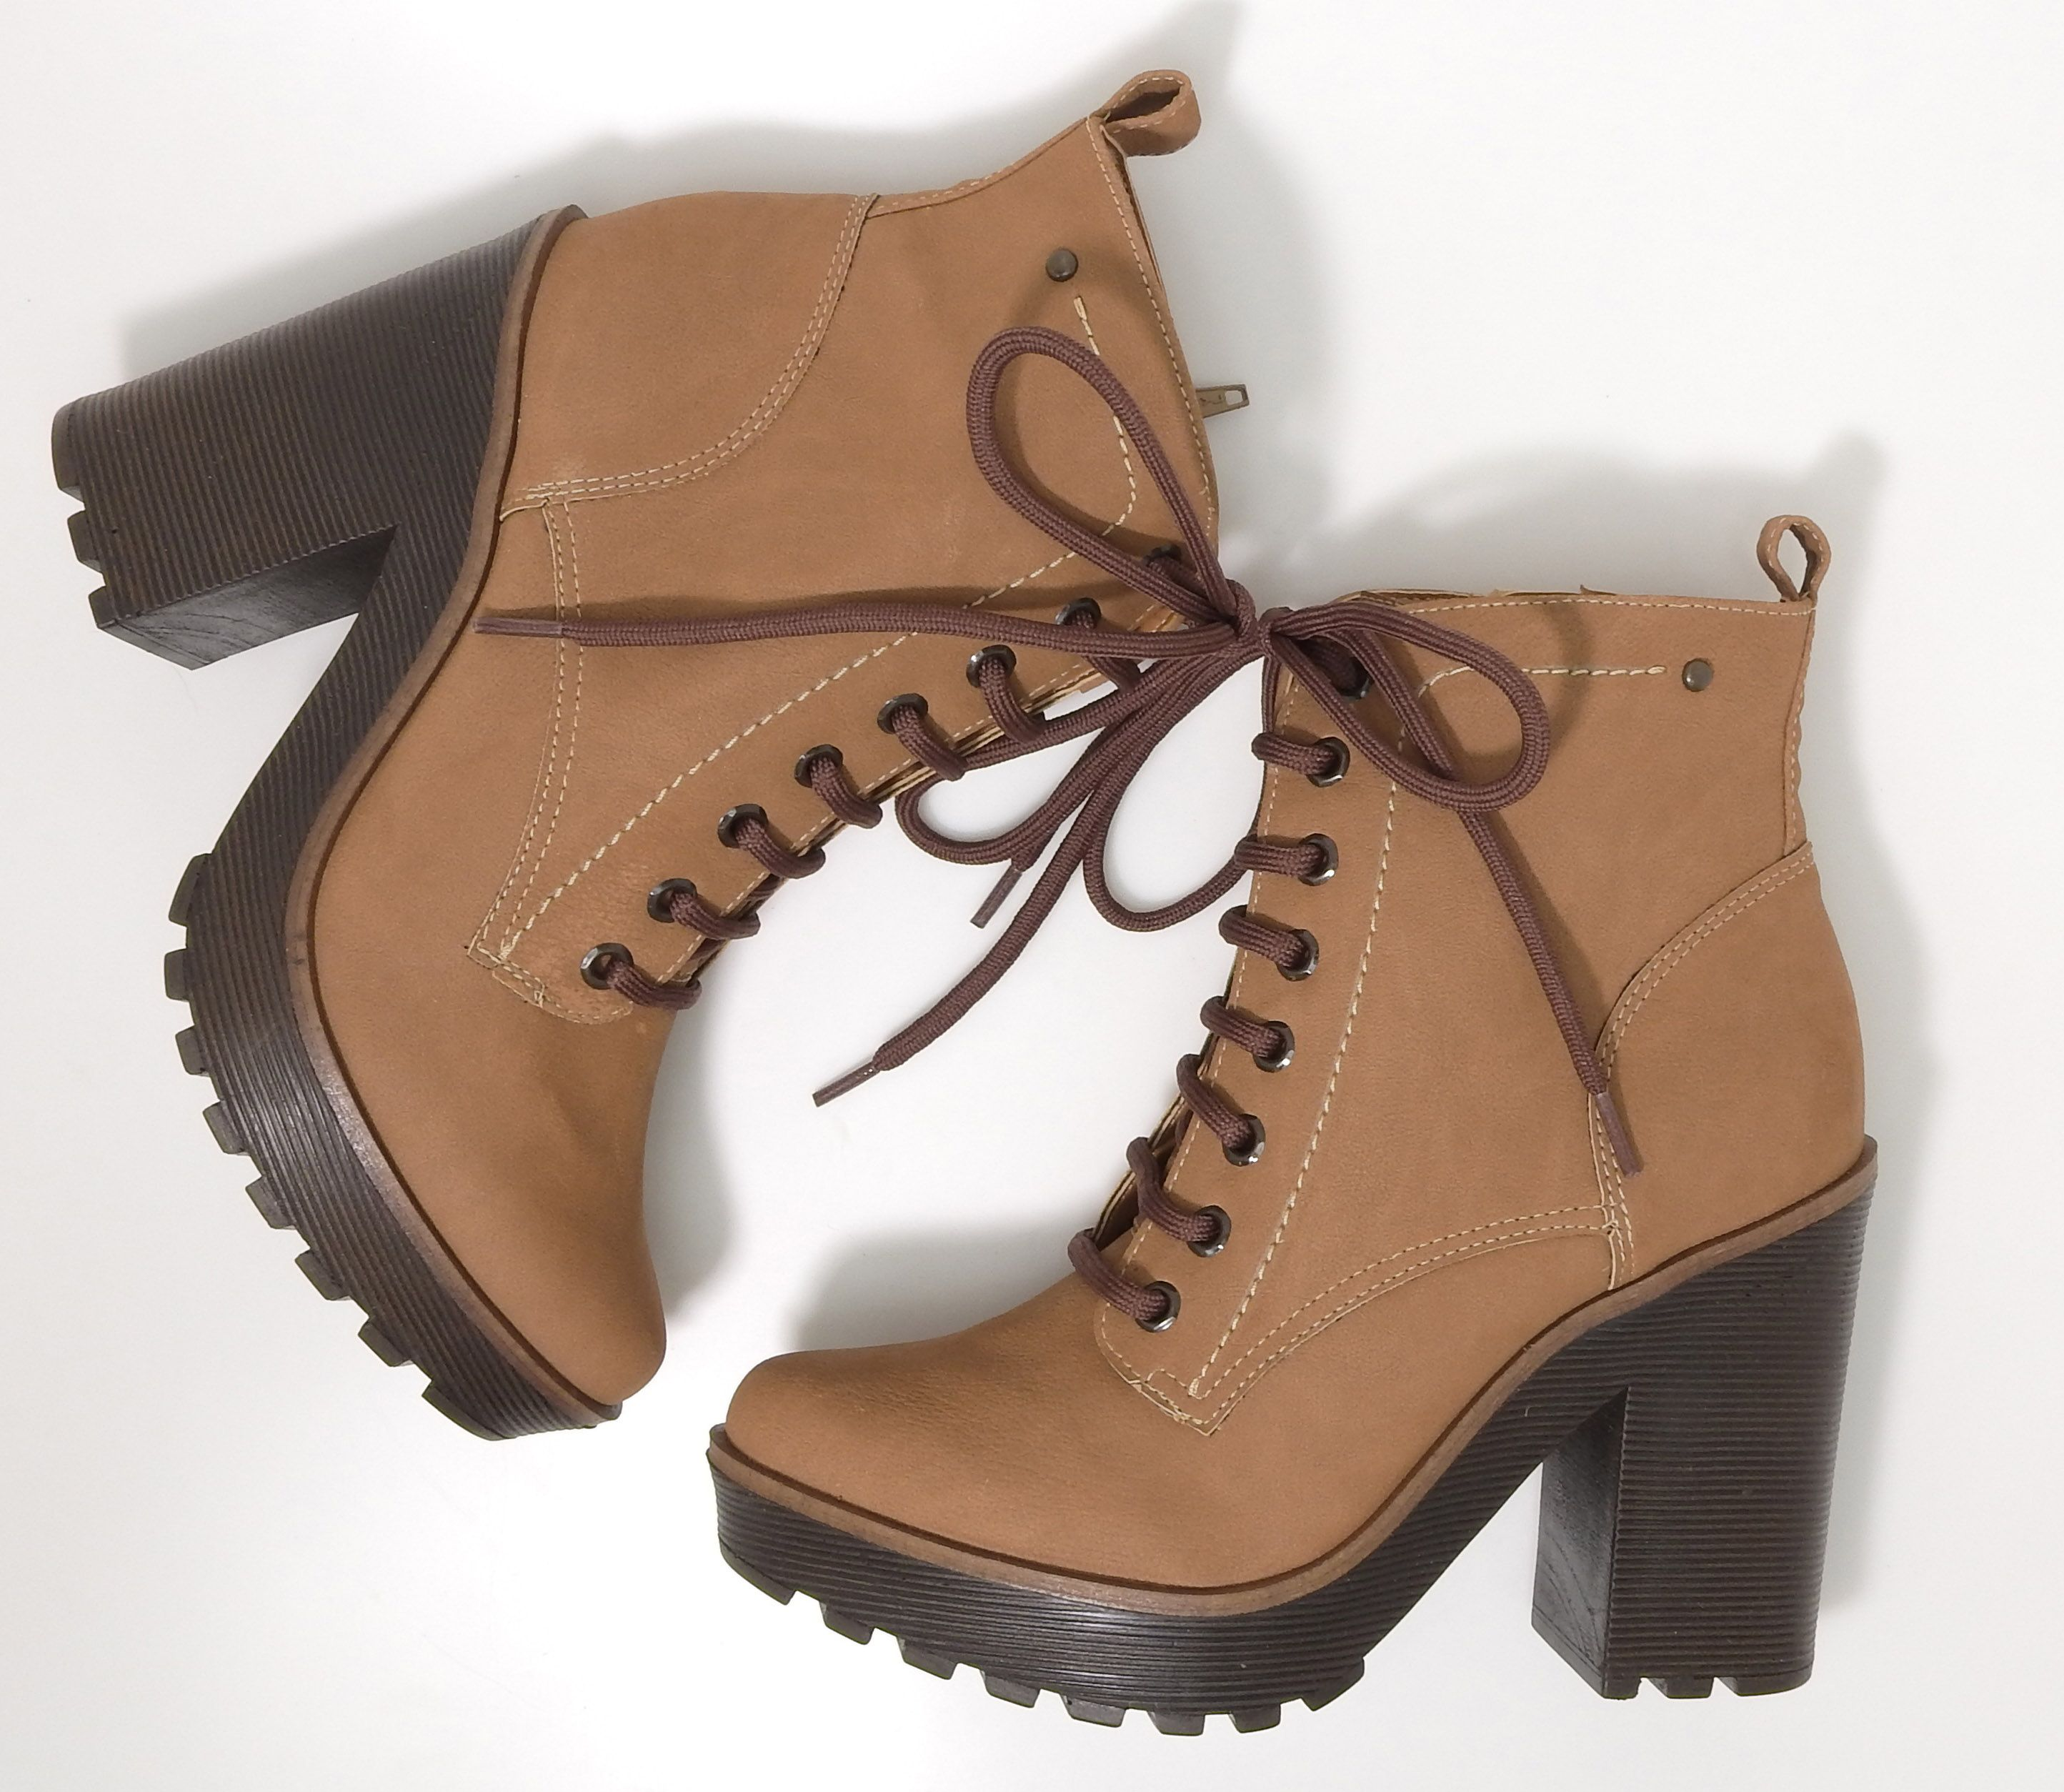 50a6f5cc3 boots - coturno - bota com salto alto - Inverno 2016 - Ref. 16-5805 ...